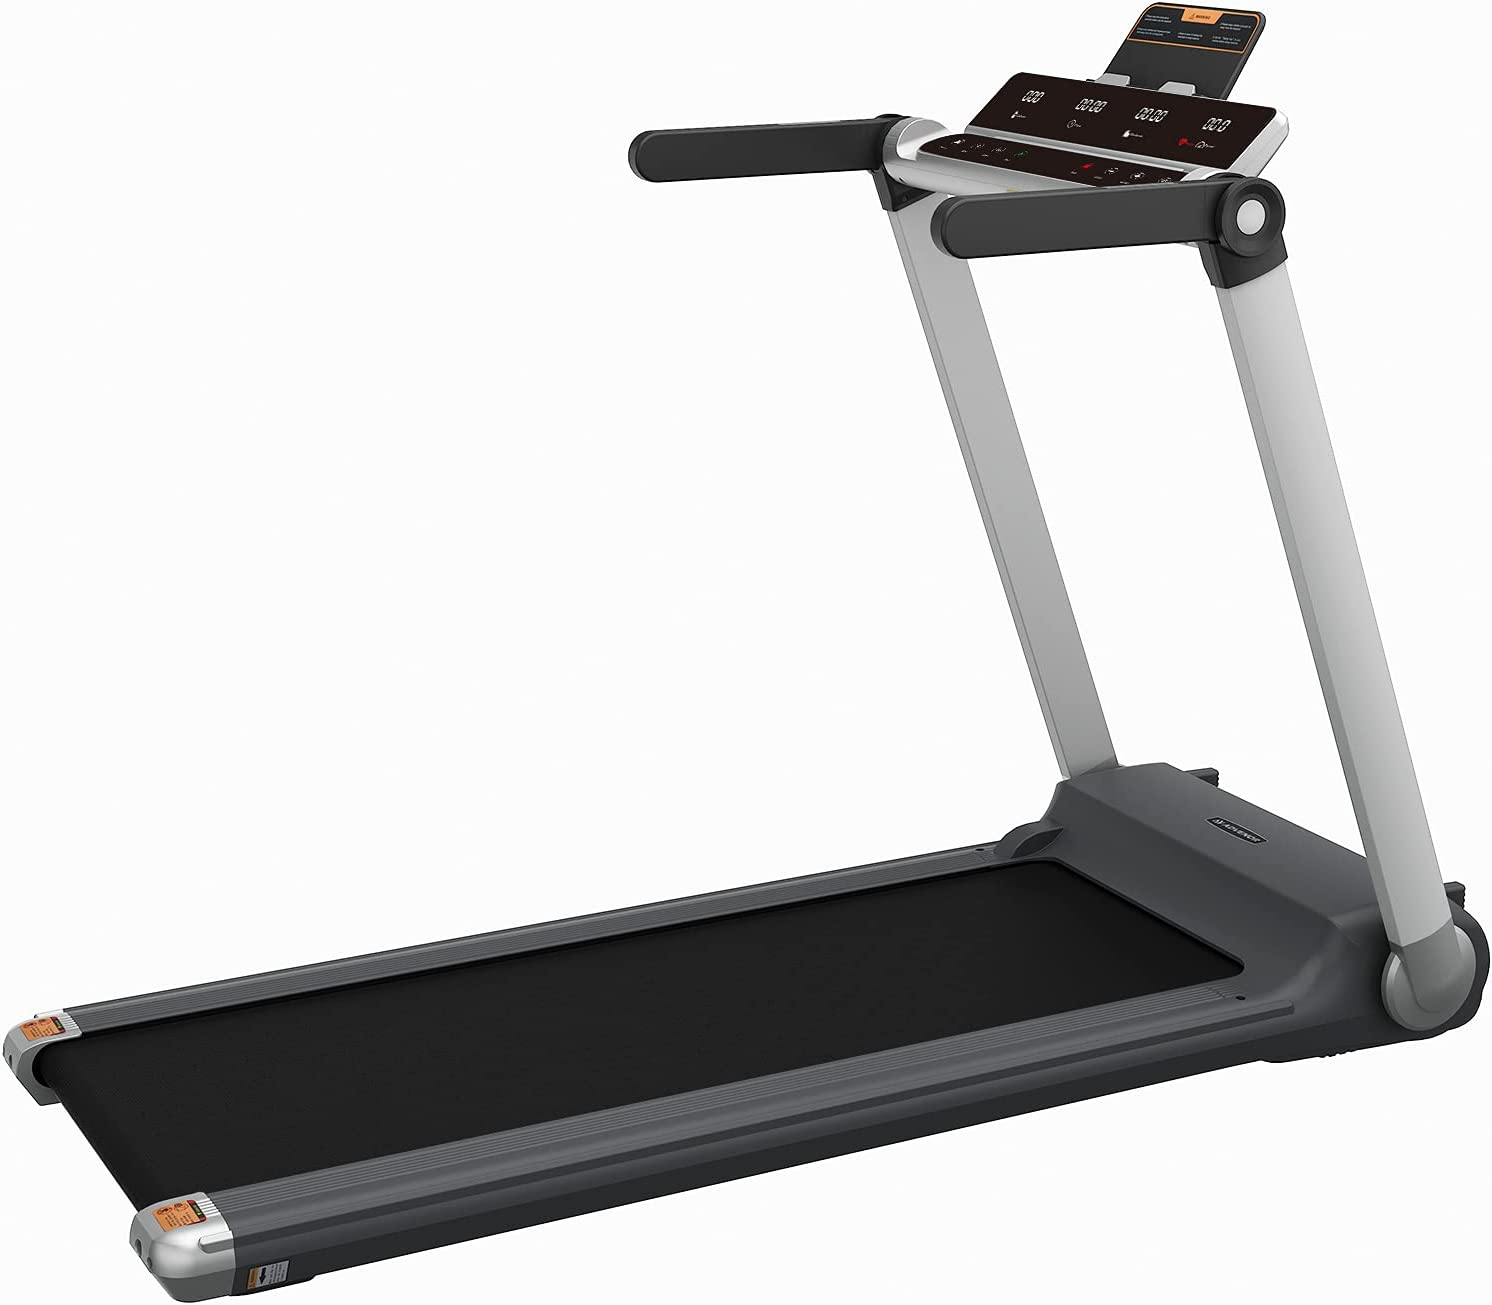 ADVENOR Treadmill Motorized Treadmills 3.0 HP Installation-Free Electric Running Machine 300 LBS Weight Capacity Folding Portable Treadmill Fitness Indoor with 24 Preset Programs (Grey)